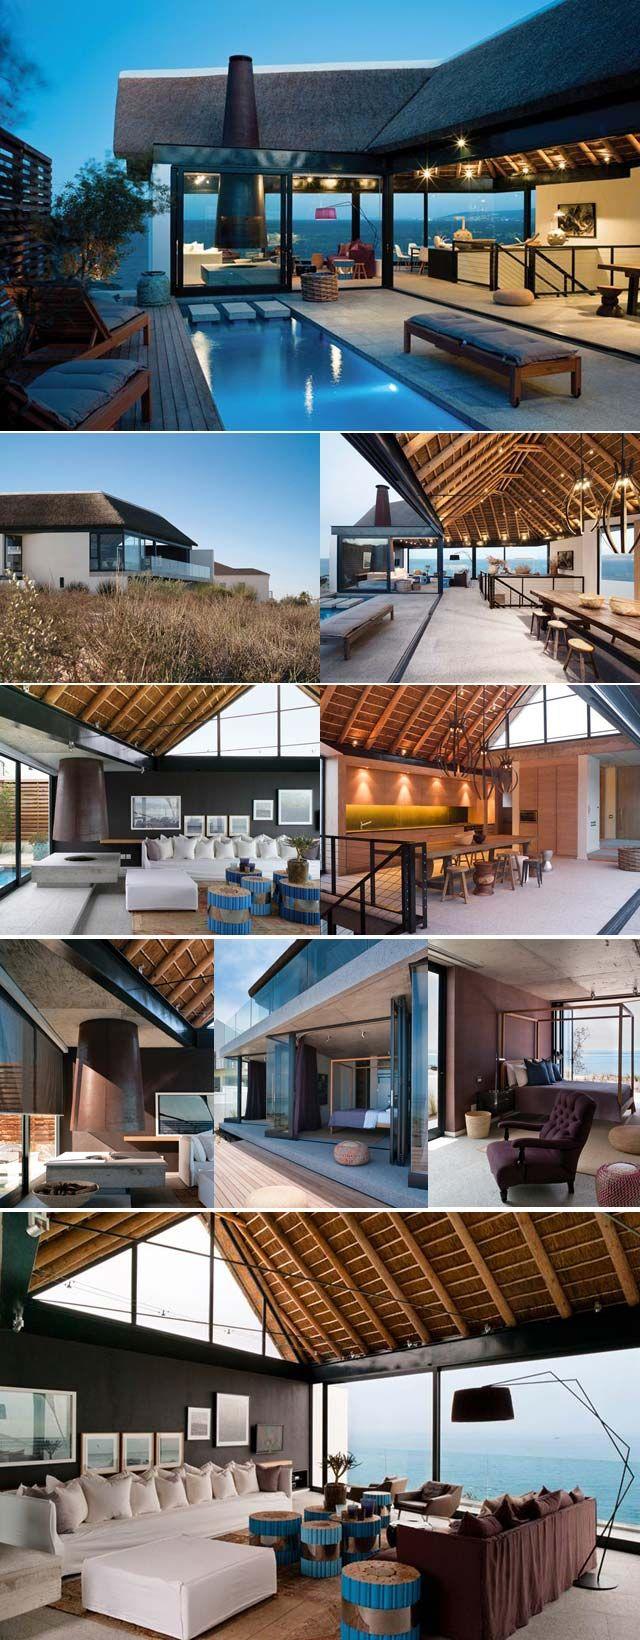 100 emejing peddlers home design gallery decorating long wall choice image home wall - Peddlers home design ...